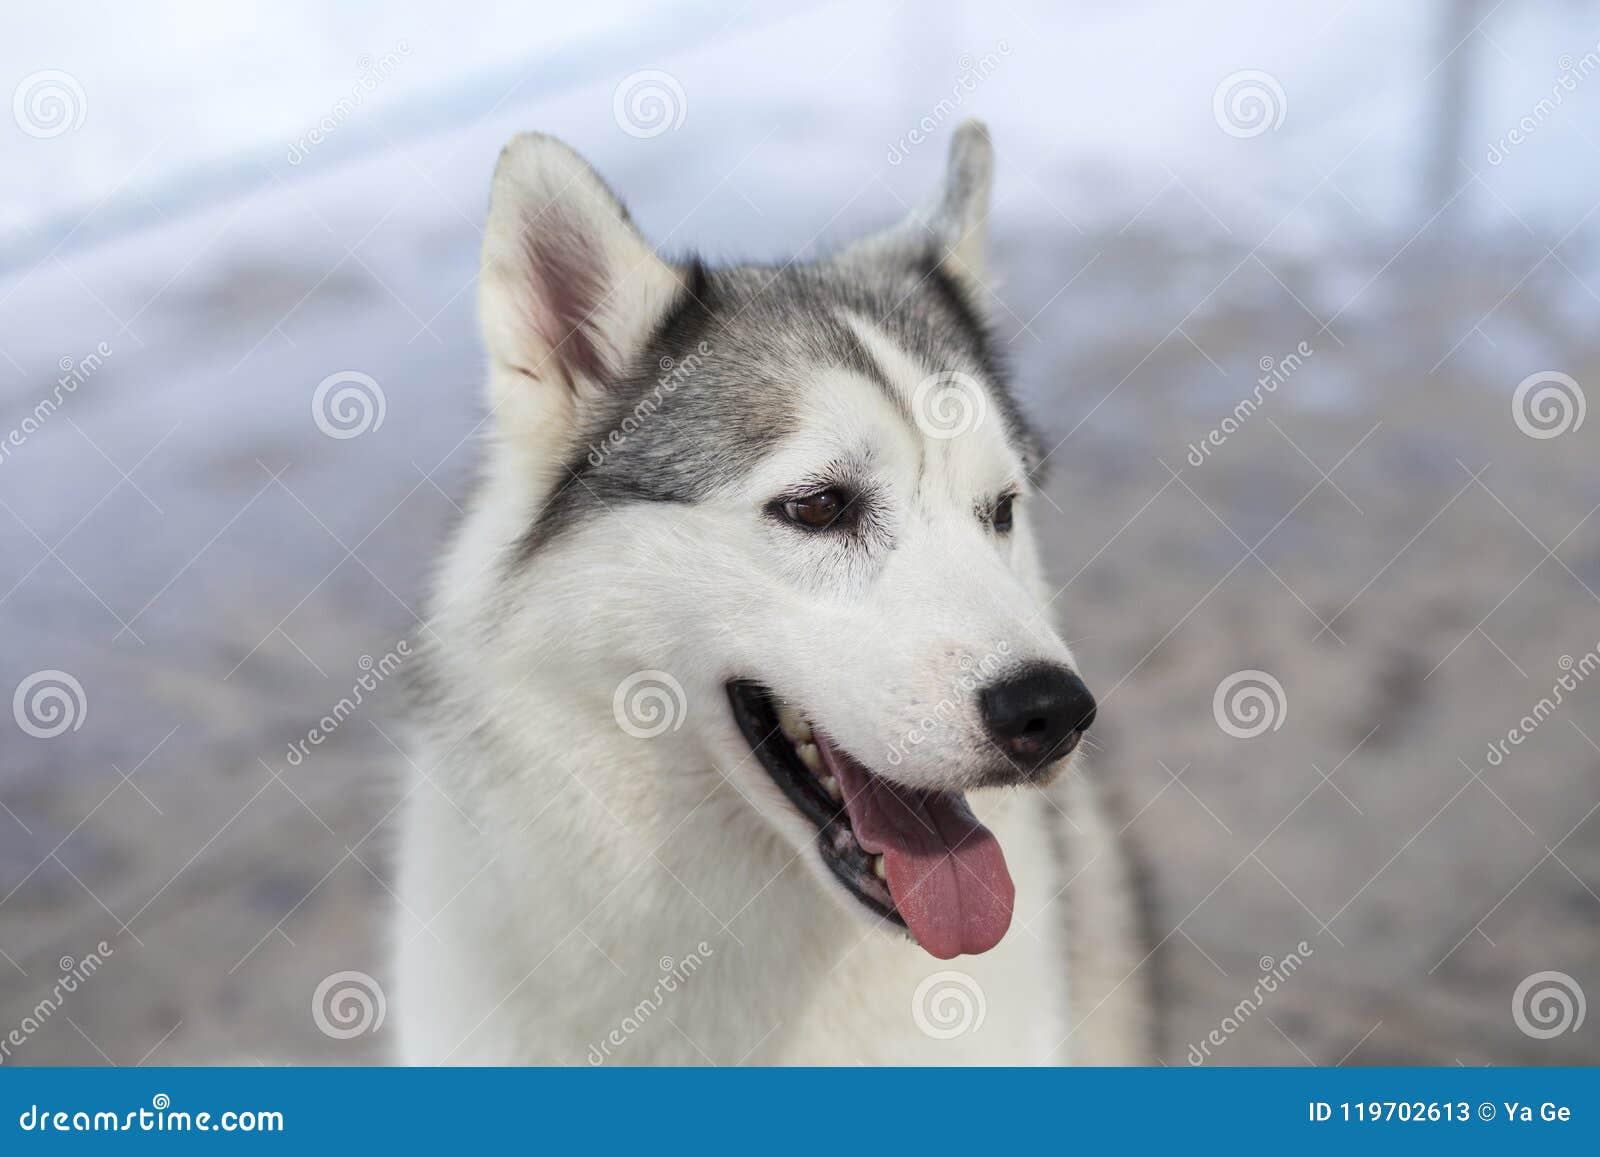 Siberian Husky Dog Stock Image Image Of Swimming Canine 119702613